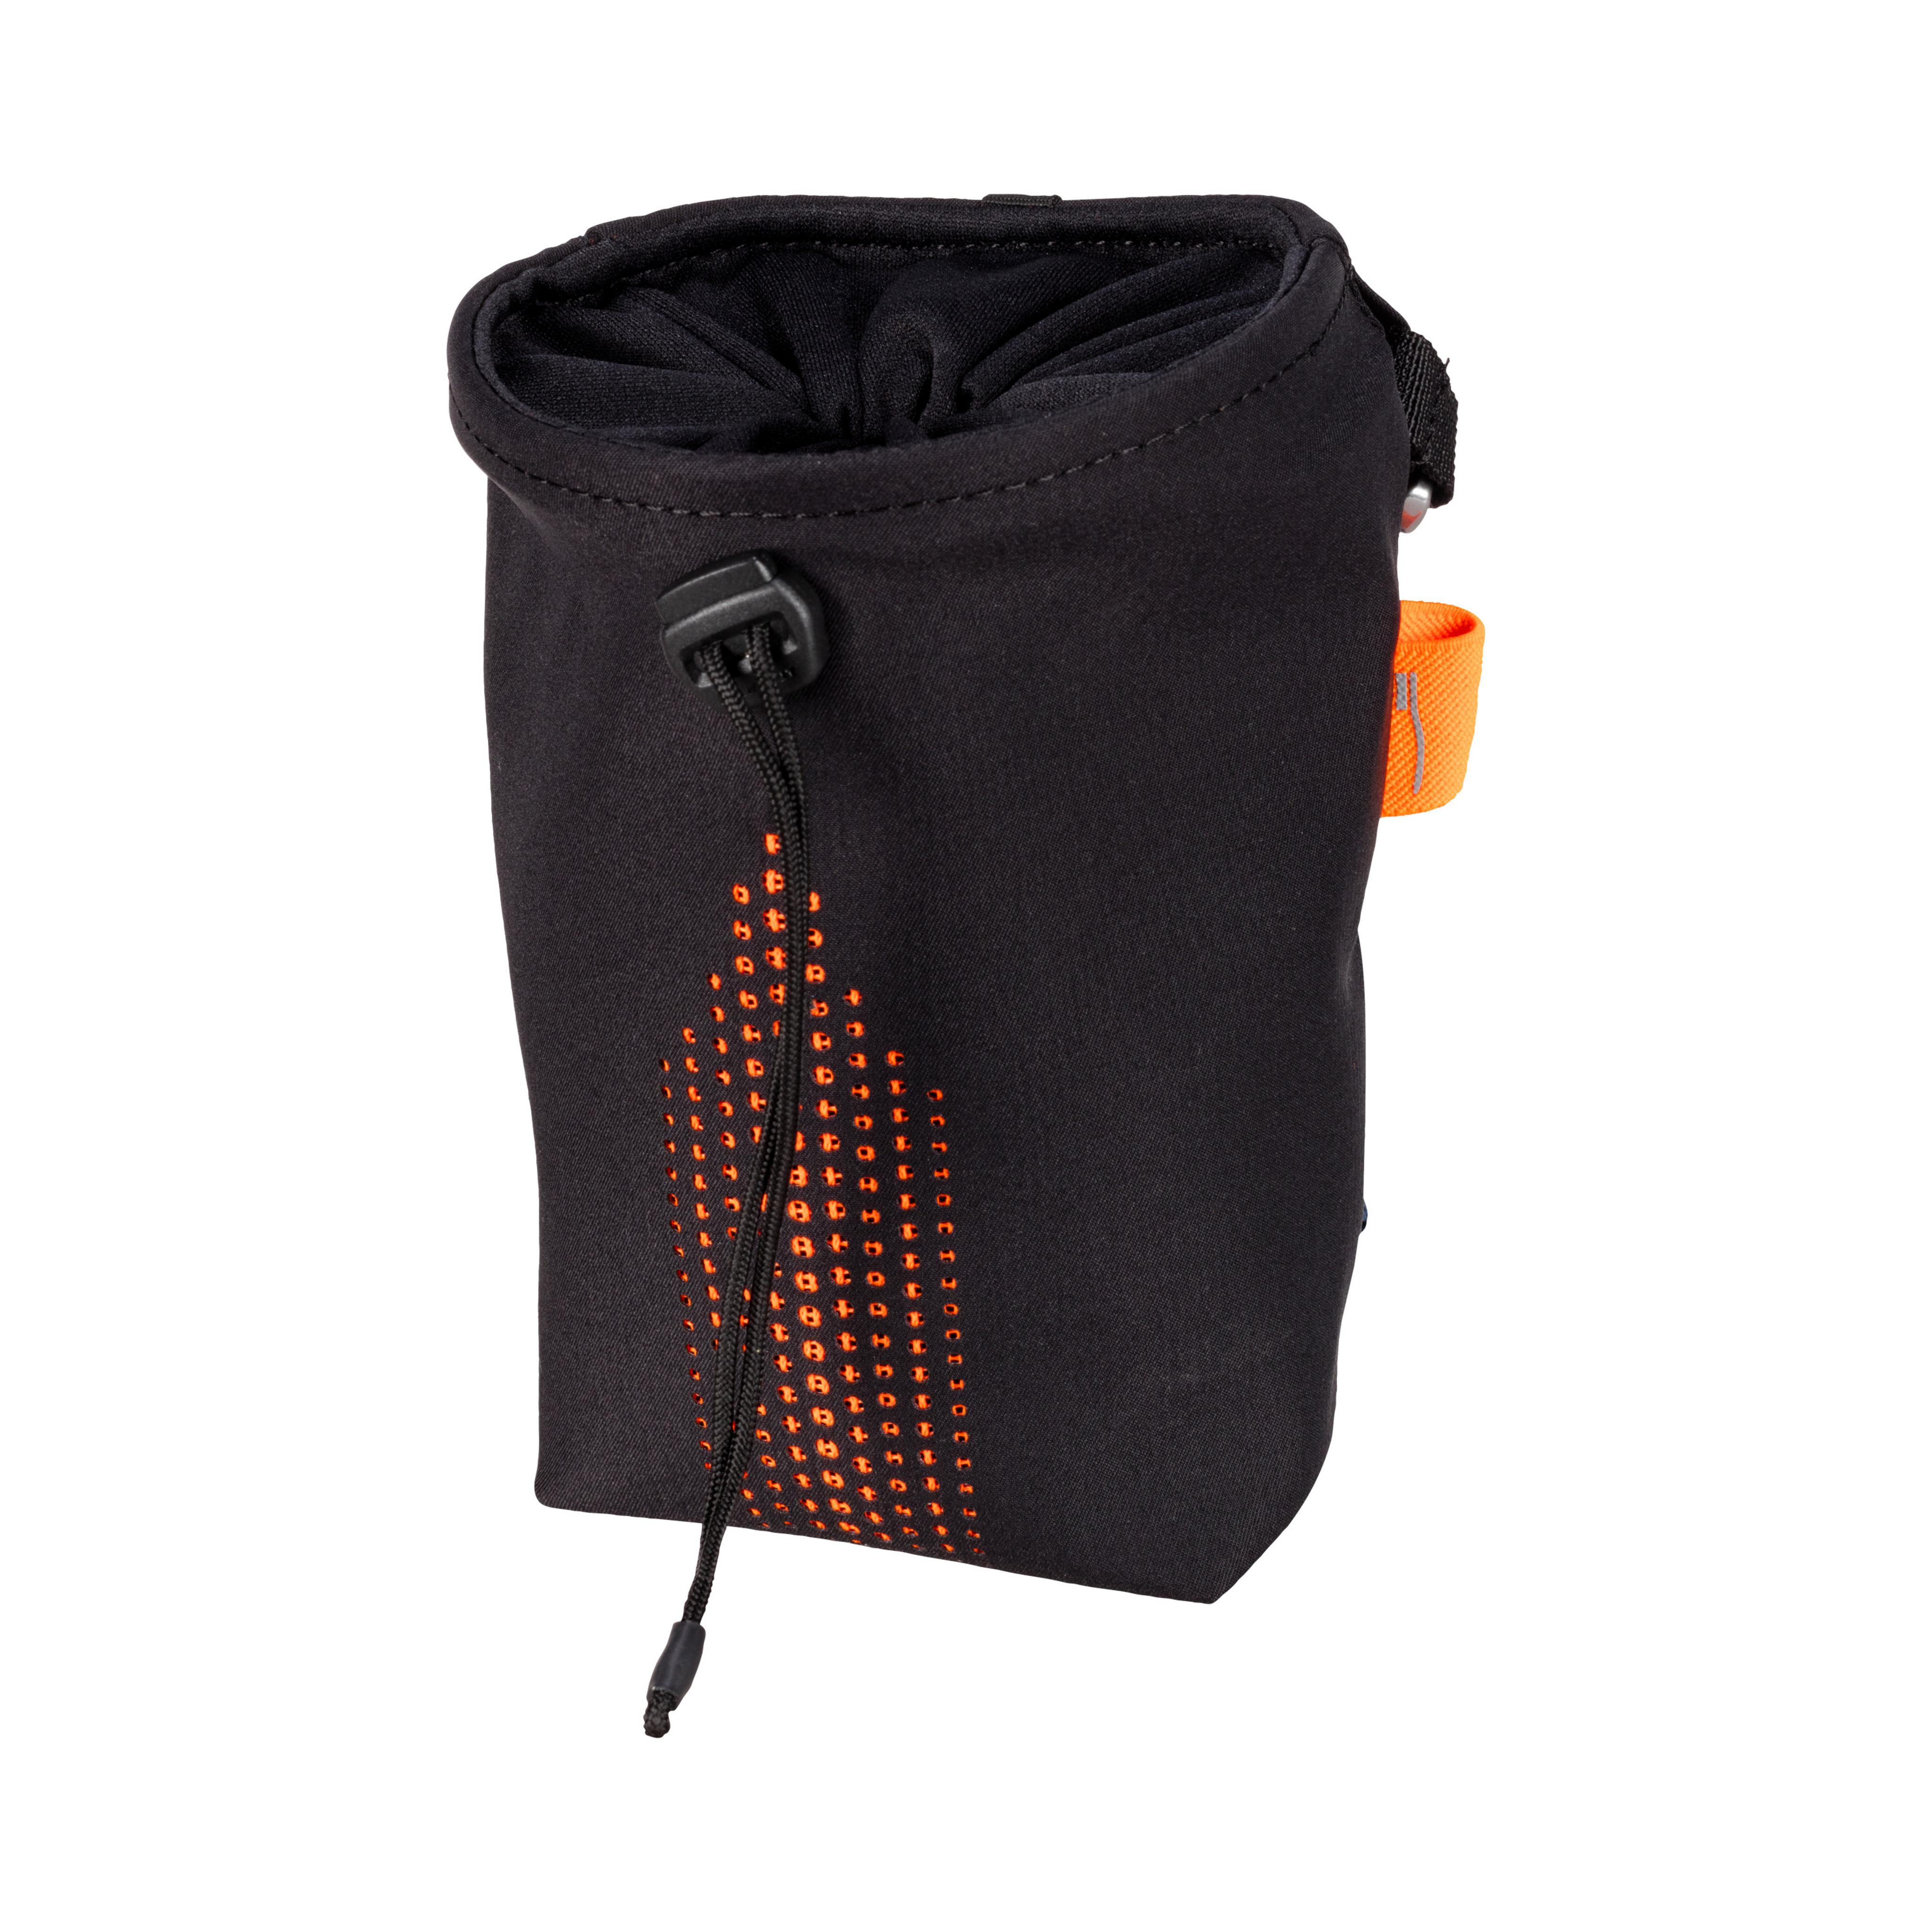 Comfort Chalk Bag - black, one size thumbnail